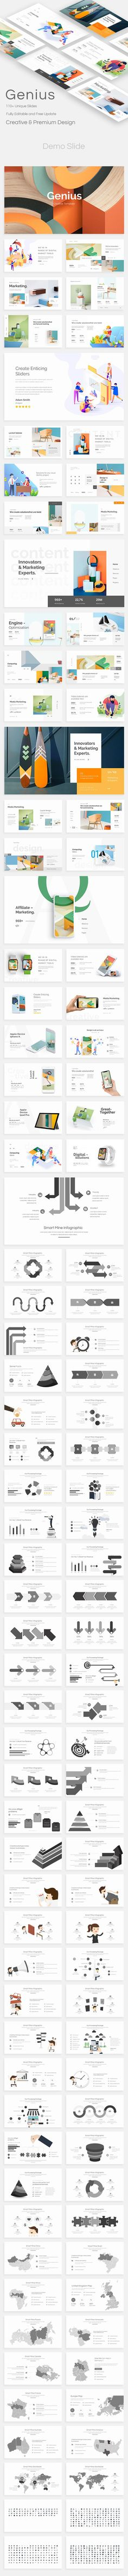 Genius Premium Keynote Template - GraphicRiver #presentation #template #presentations  #graphicdesign #design #EnvatoMarket #graphicdesigner #BestDesignResources Presentation Design, Presentation Templates, Seo Analysis, World Data, Creative Powerpoint Templates, Keynote Template, Graphic Design, Flowchart, Screen Size